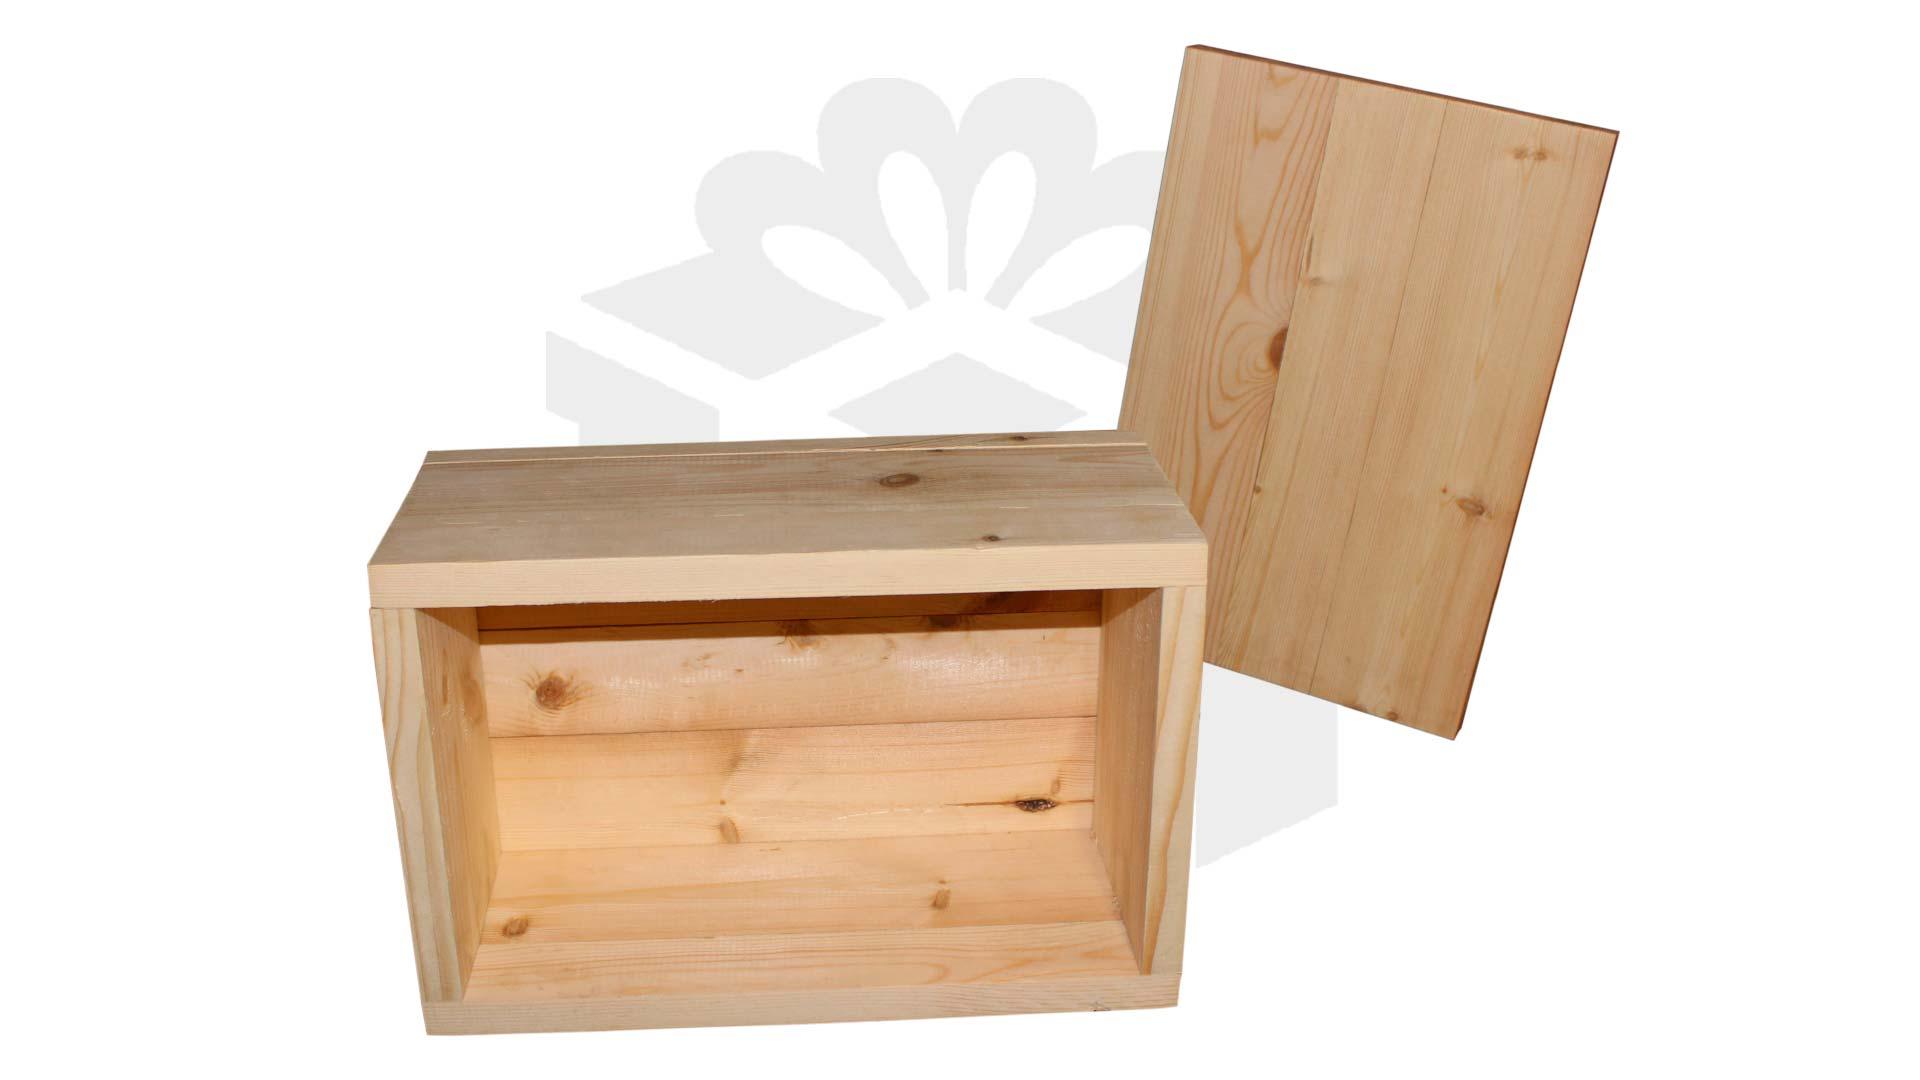 wood.box.t1_1.1_1080x1920_logojpg